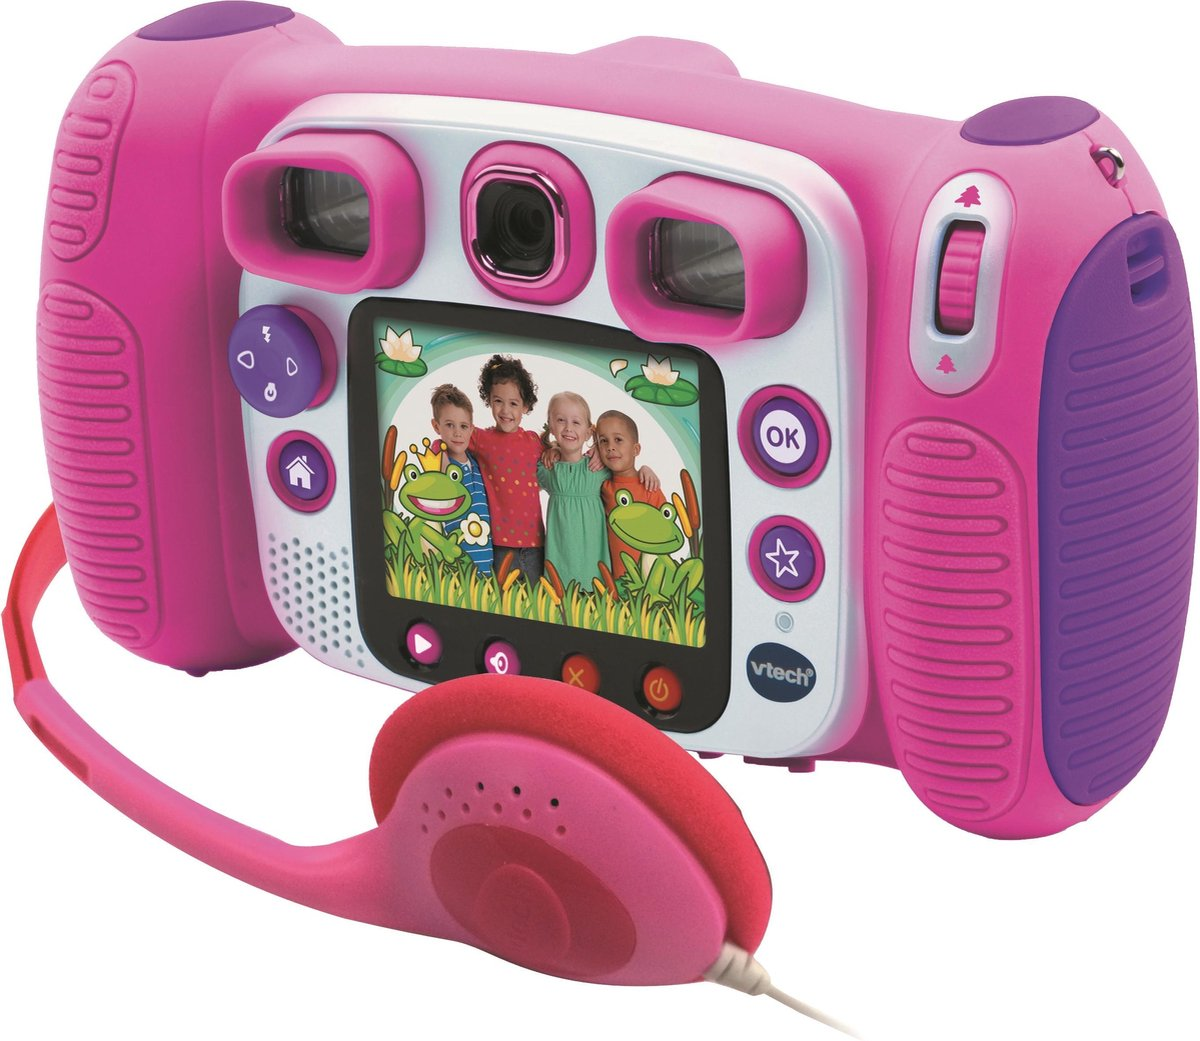 VTech KidiZoom Duo 5.0 Megapixel Roze - Kindercamera - VTech